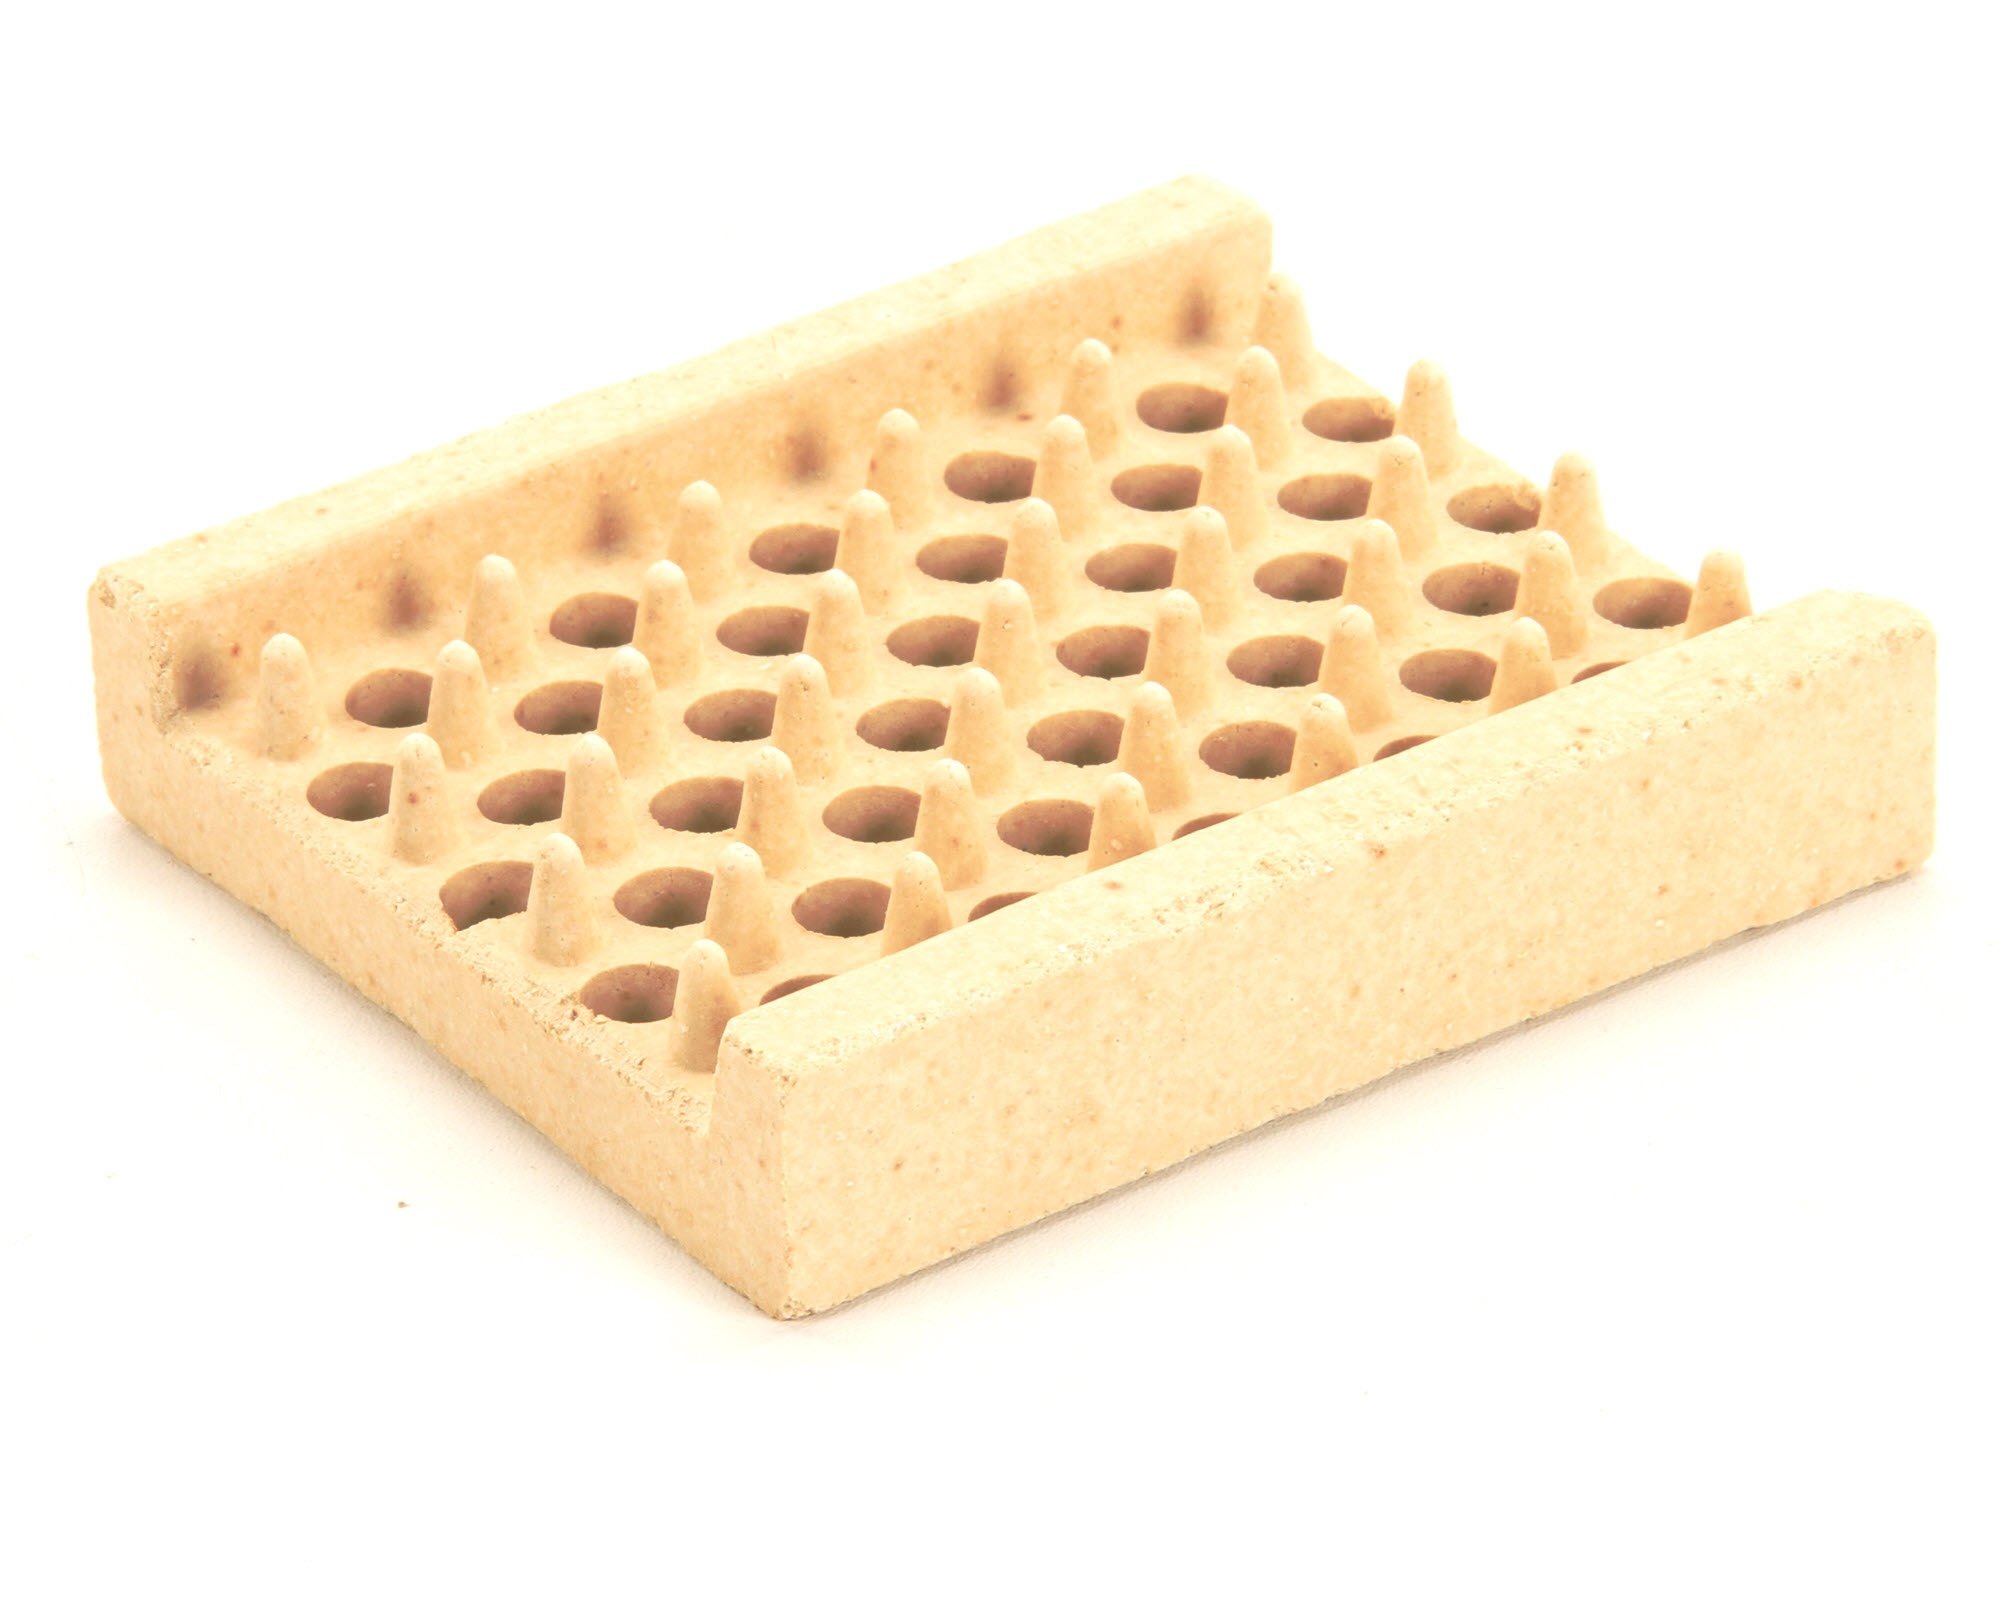 Cheap X White Ceramic Tile Find X White Ceramic Tile Deals On - Cheap 4x4 tiles